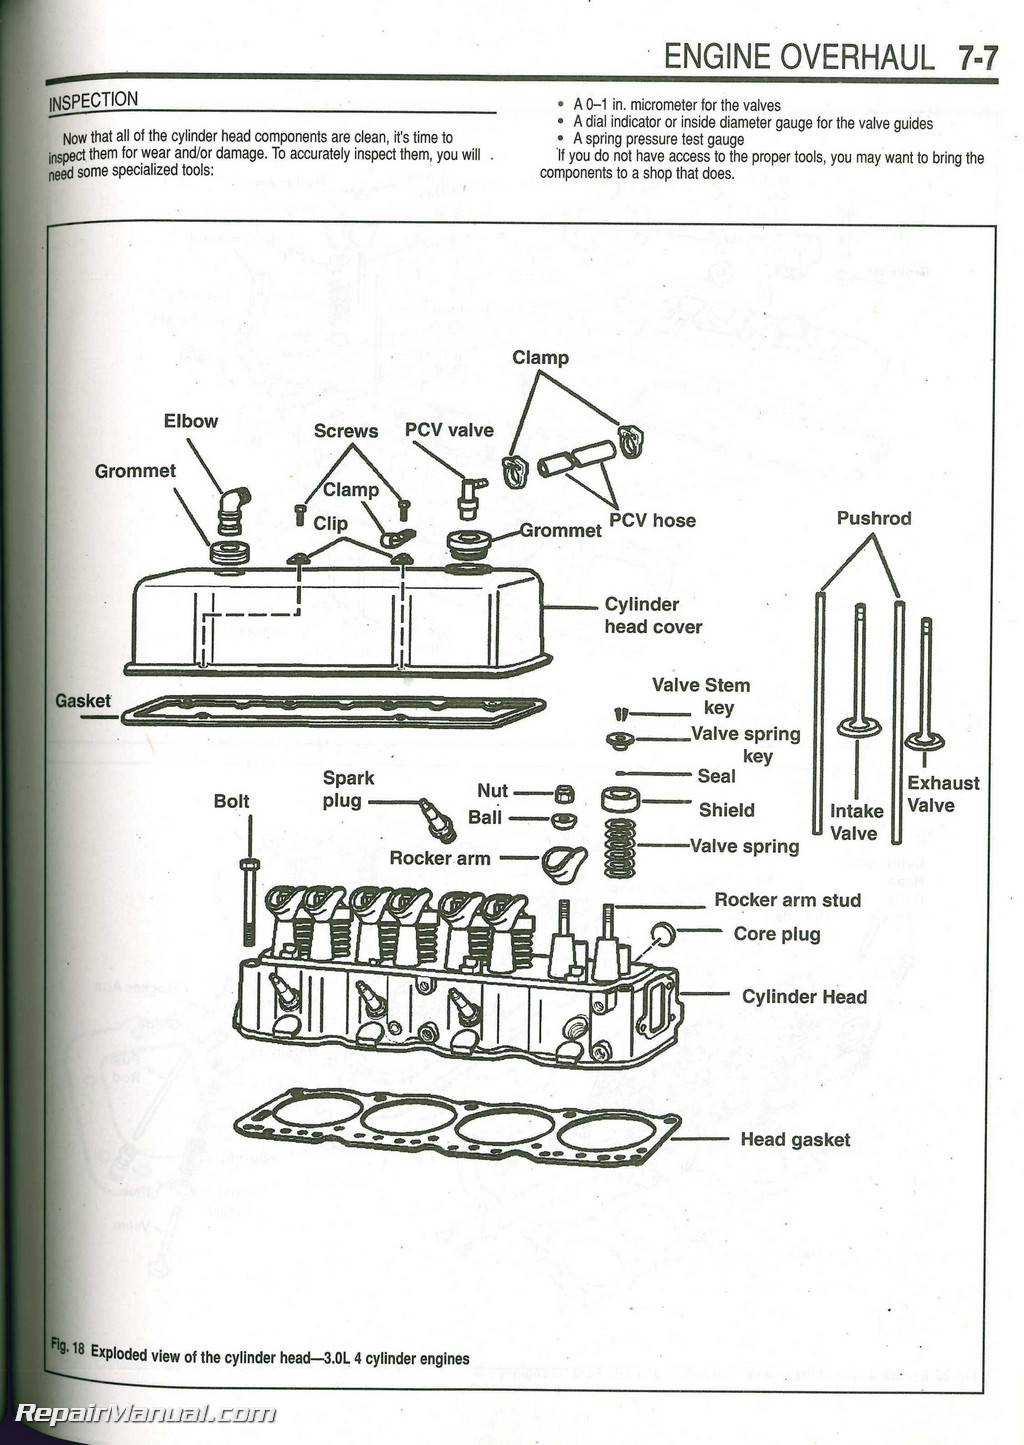 1996 Yamaha Golf Cart Wiring Diagram Omc Cobra Stern Drive Boat Engine Repair Manual 1986 1998